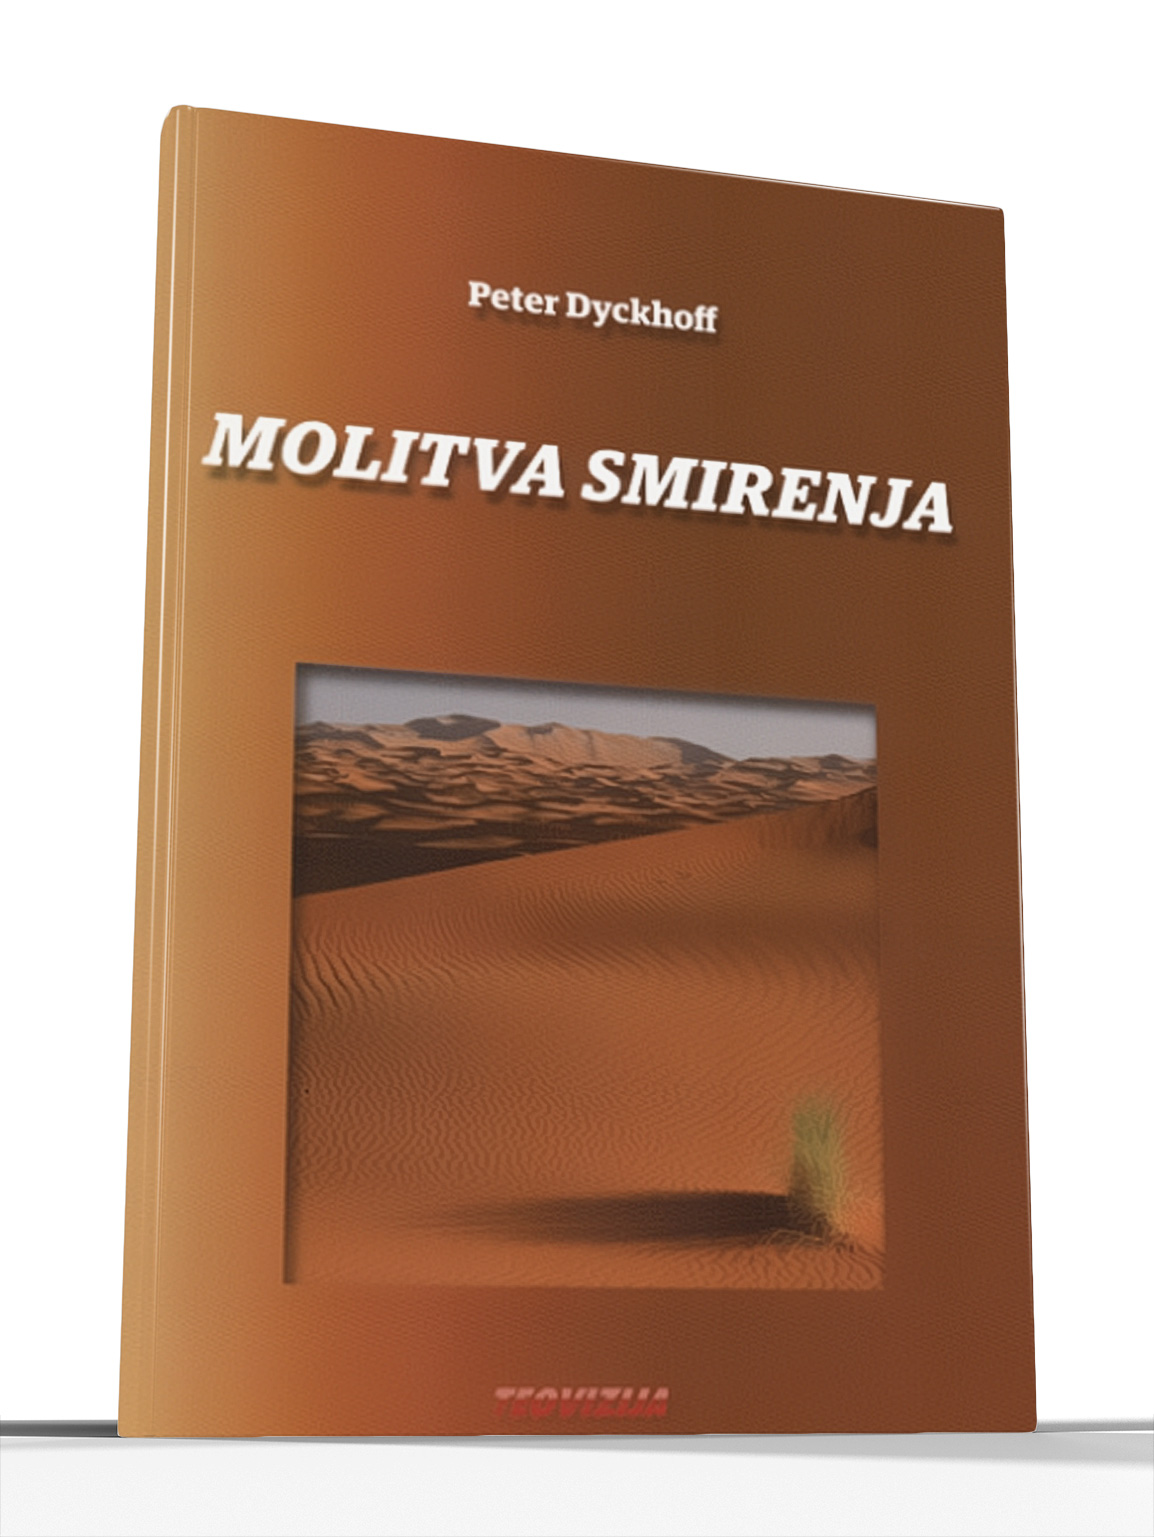 MOLITVA SMIRENJA - Peter Dyckhoff